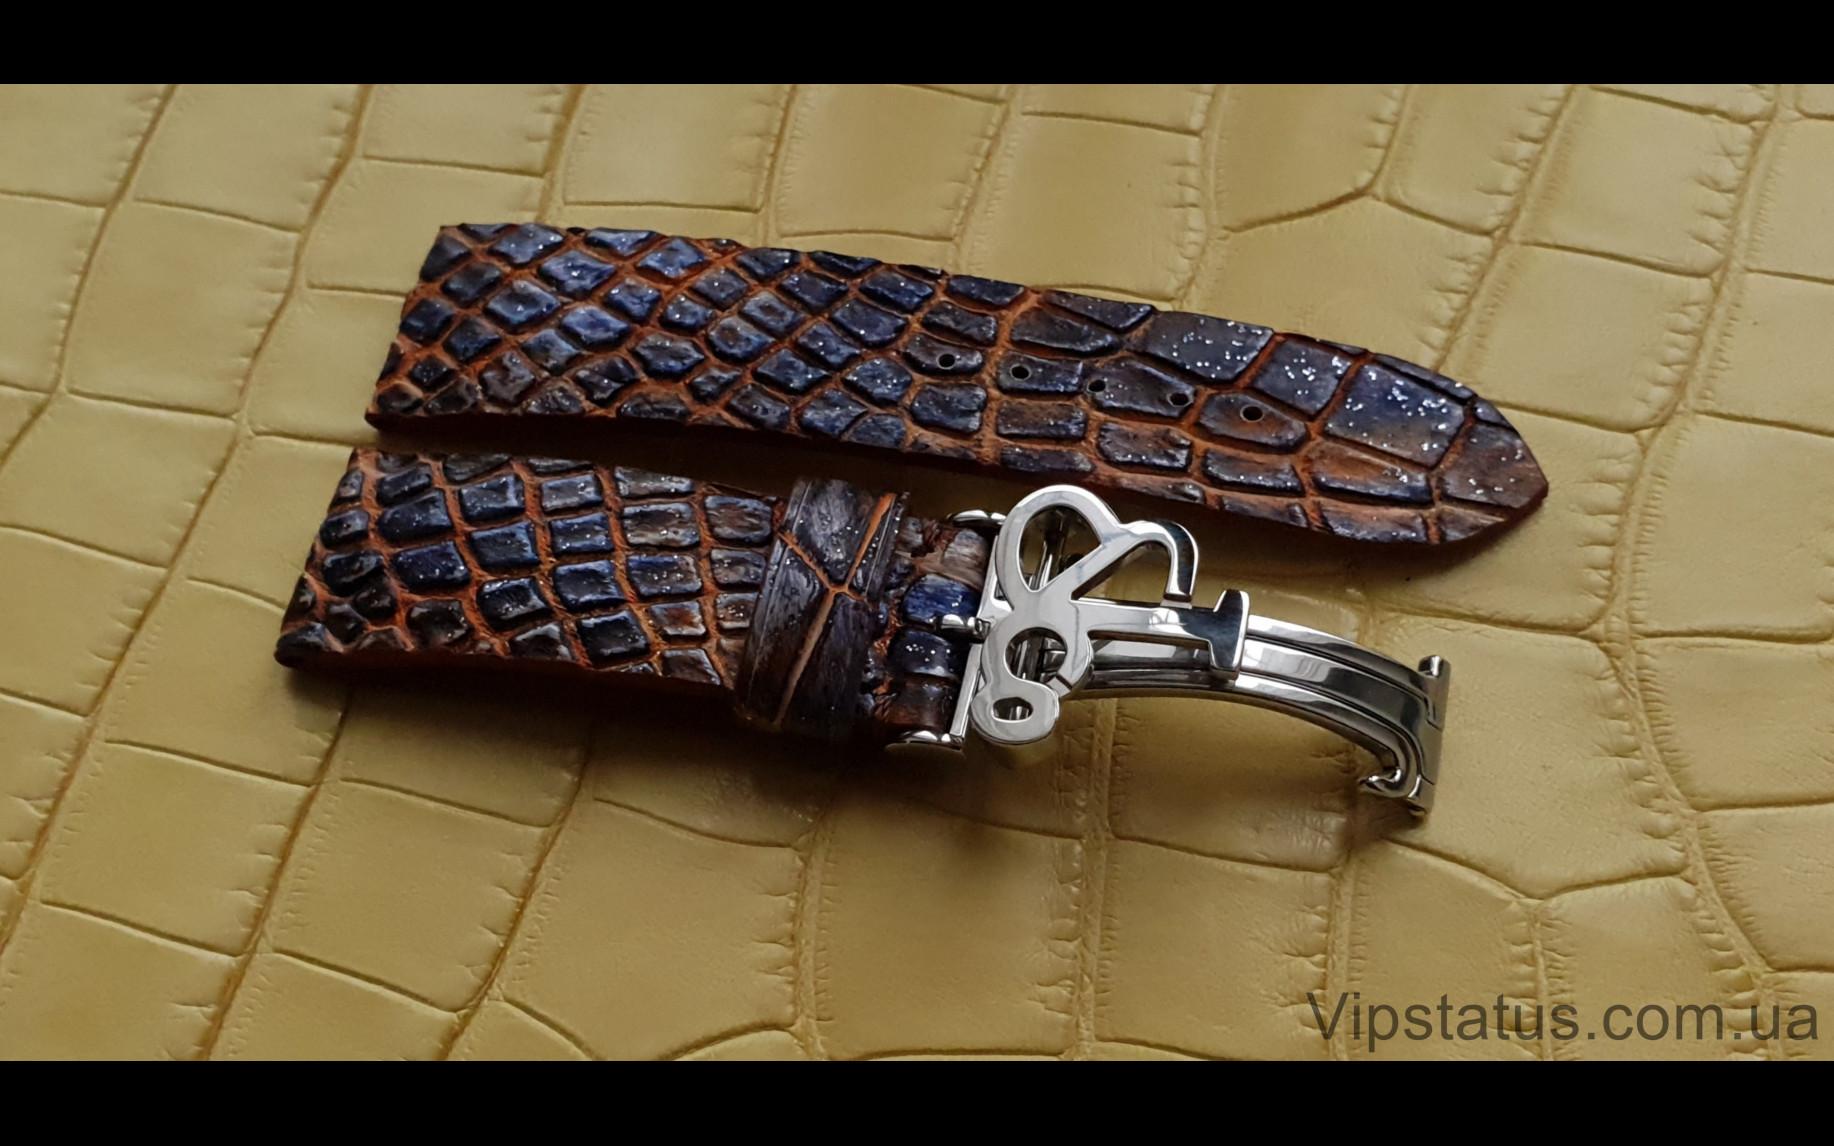 Elite Премиум ремешок для часов Jacob&Co кожа крокодила Premium Crocodile Strap for Jacob&Co watches image 4